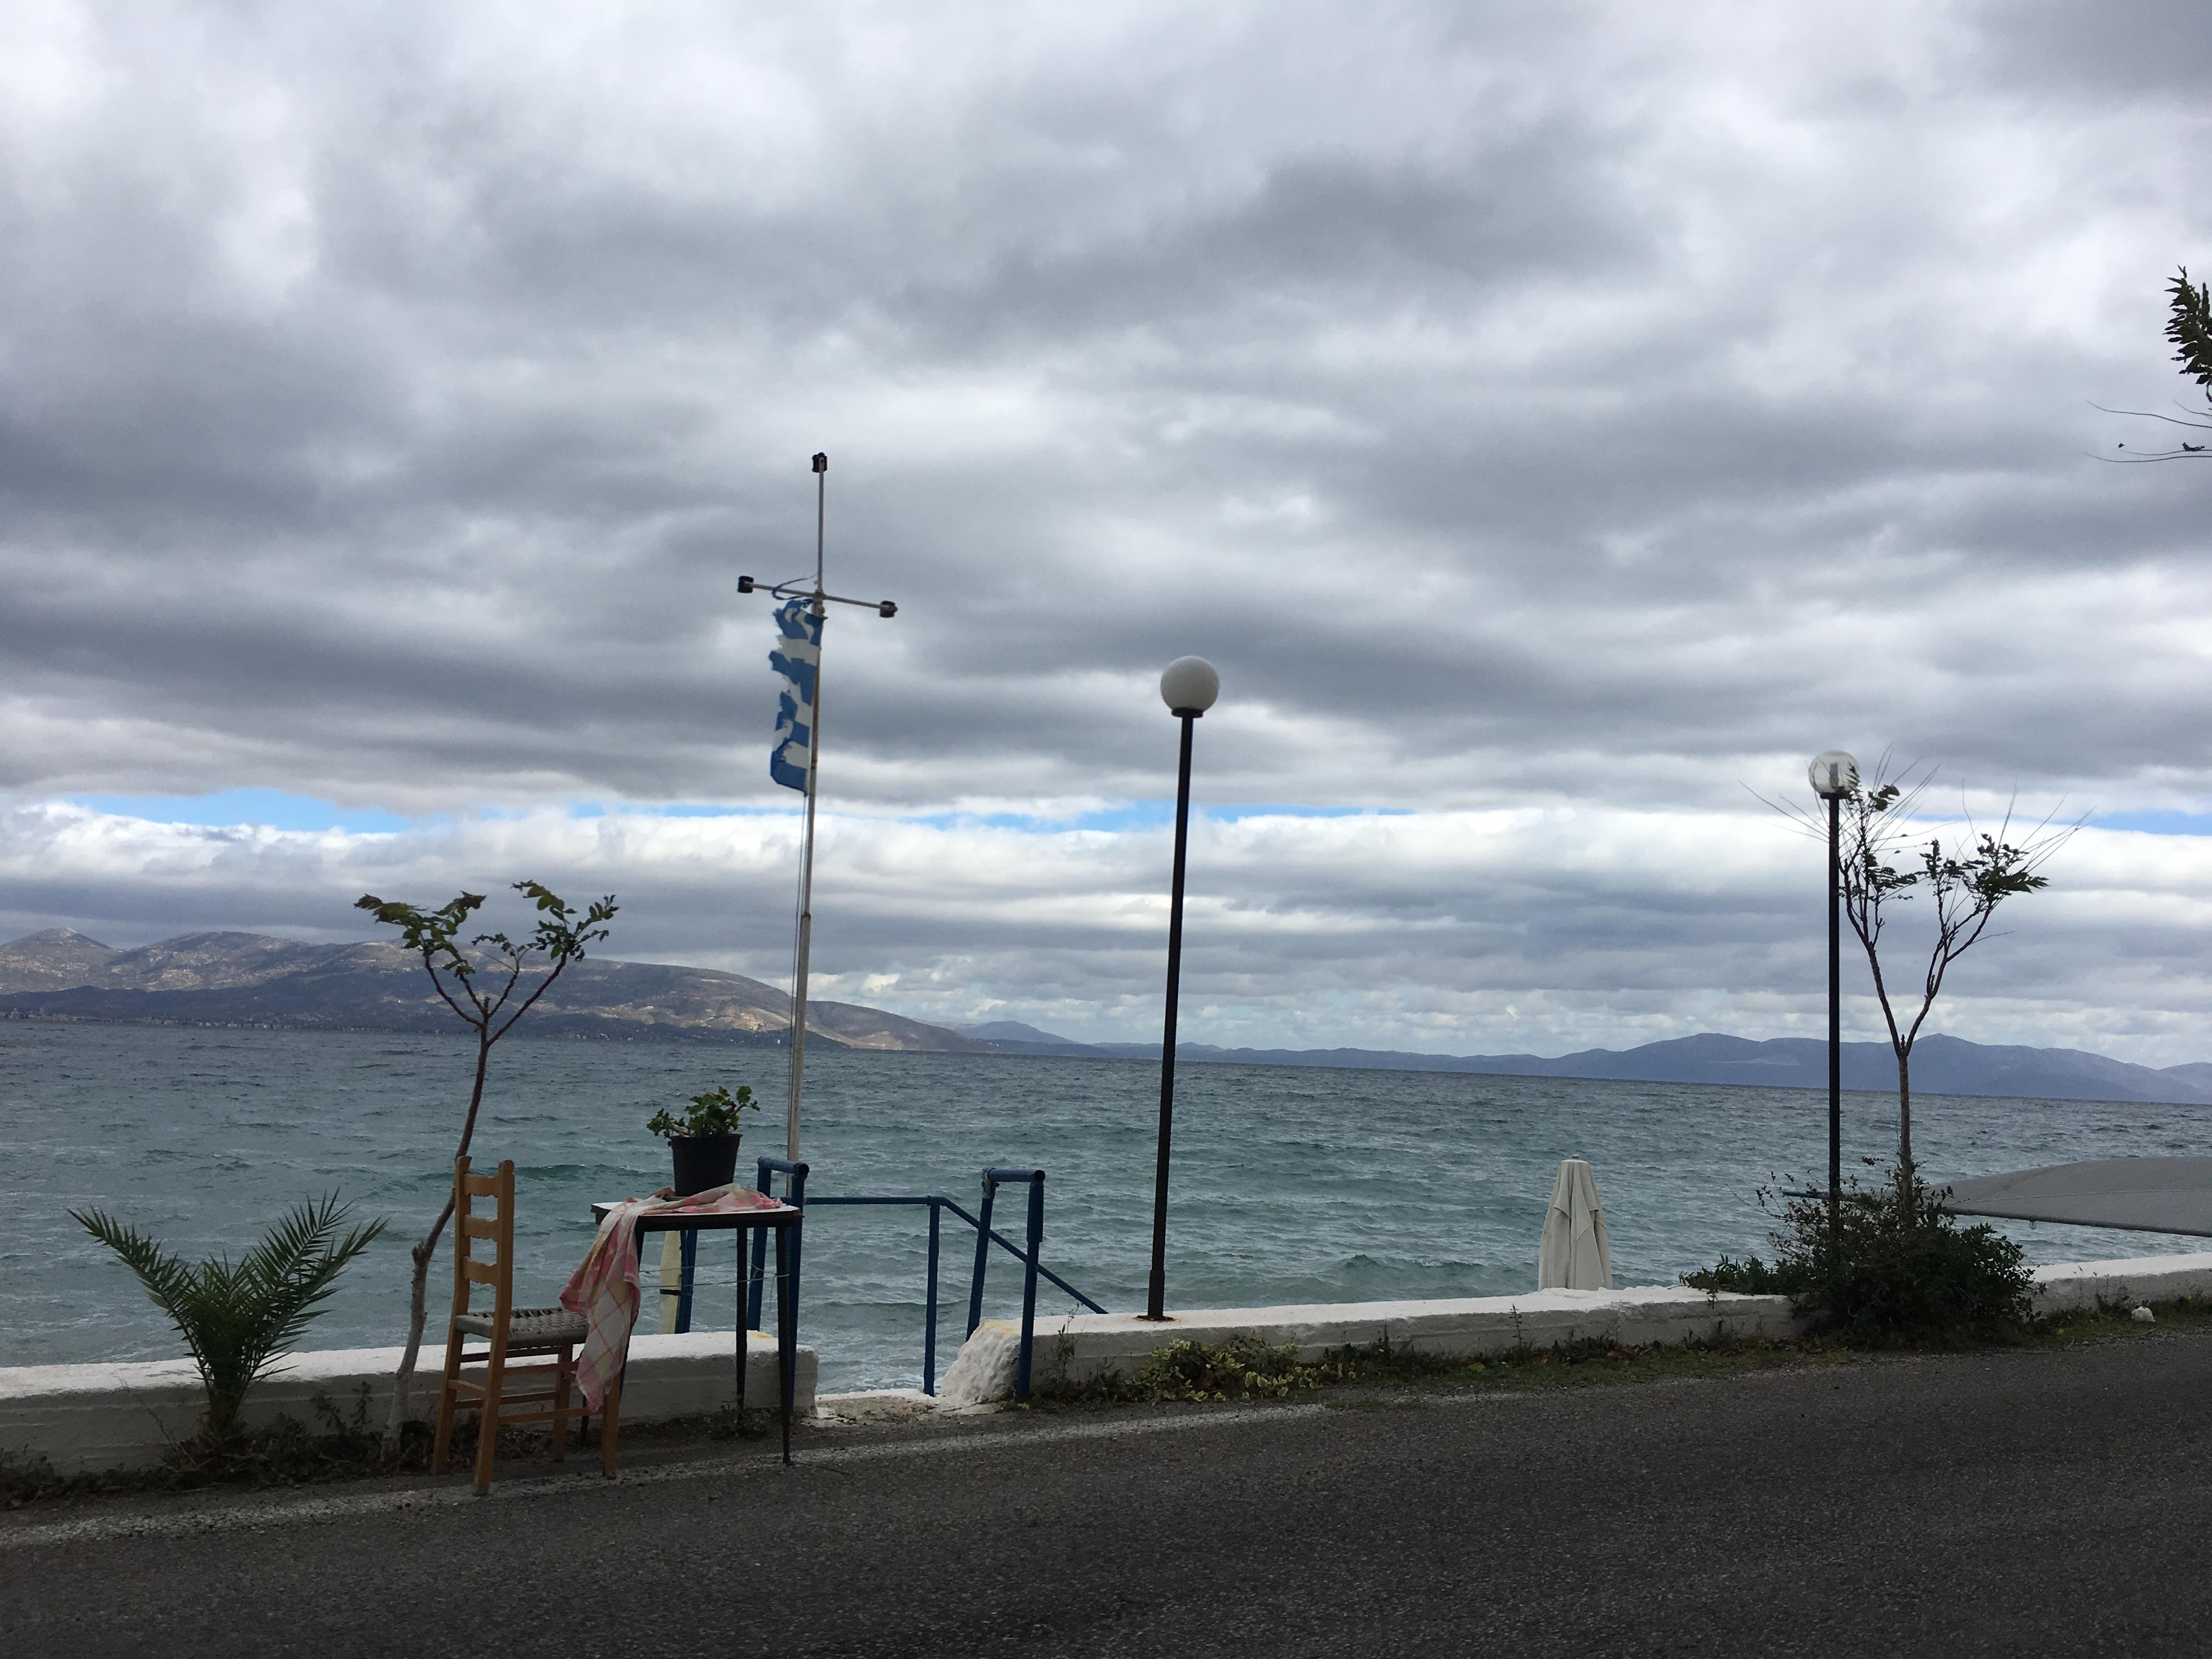 The magic of Nafplio and more of Greece- Trips with Kostas Kefalakis by Shuli Sapir-Nevo Photo and Motto - Illustrated by shulamit SAPIR-NEVO - Ourboox.com